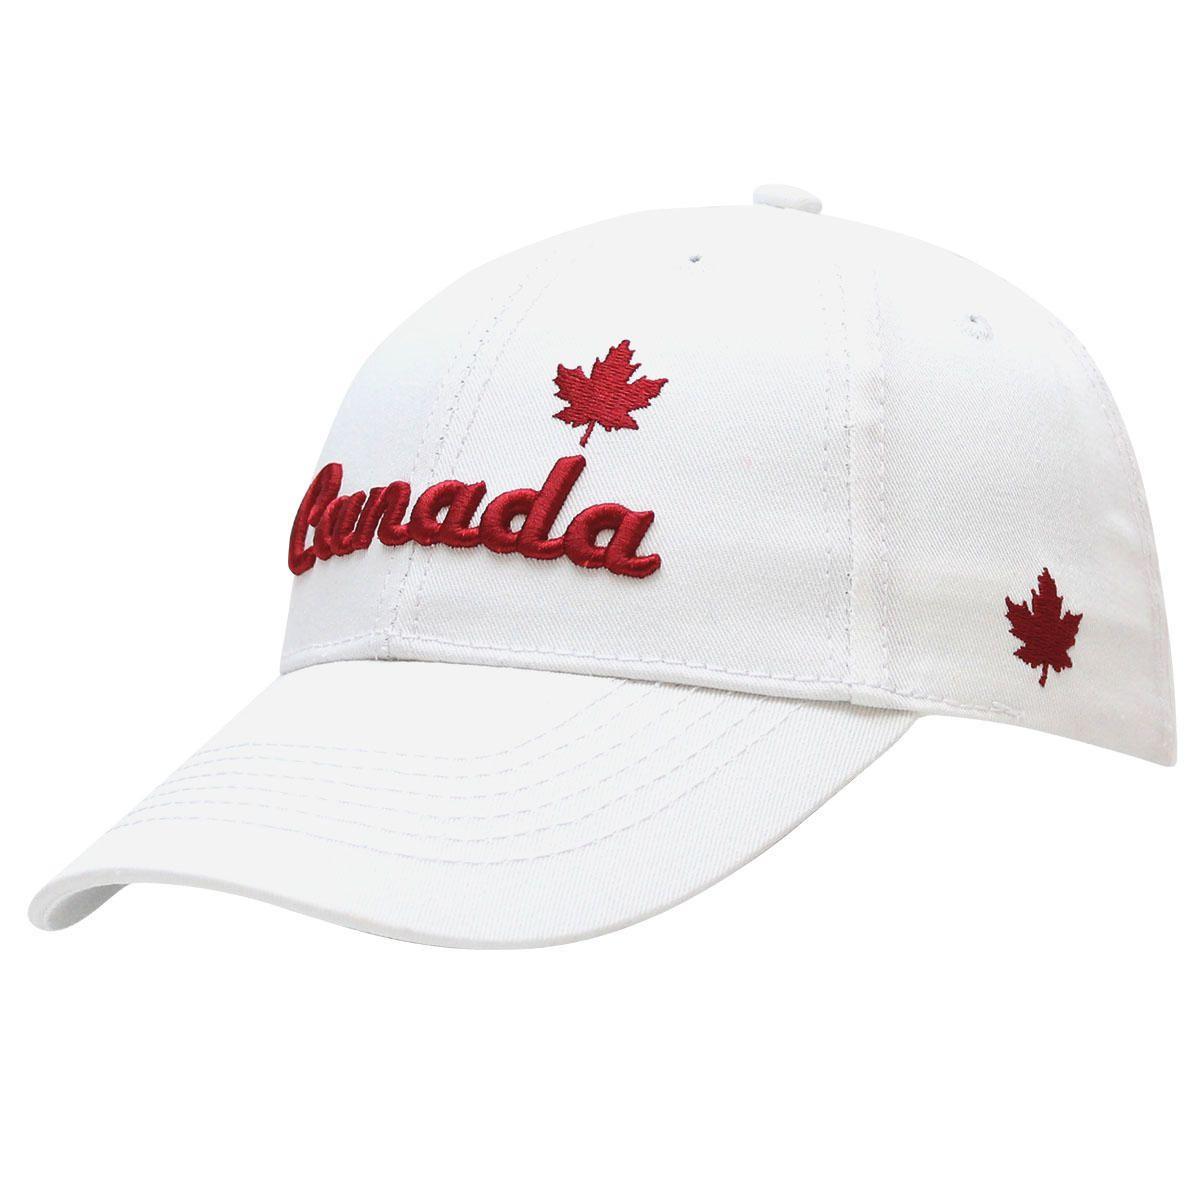 Canadiana Women's 3D Embroidered Baseball Hat | Walmart Canada